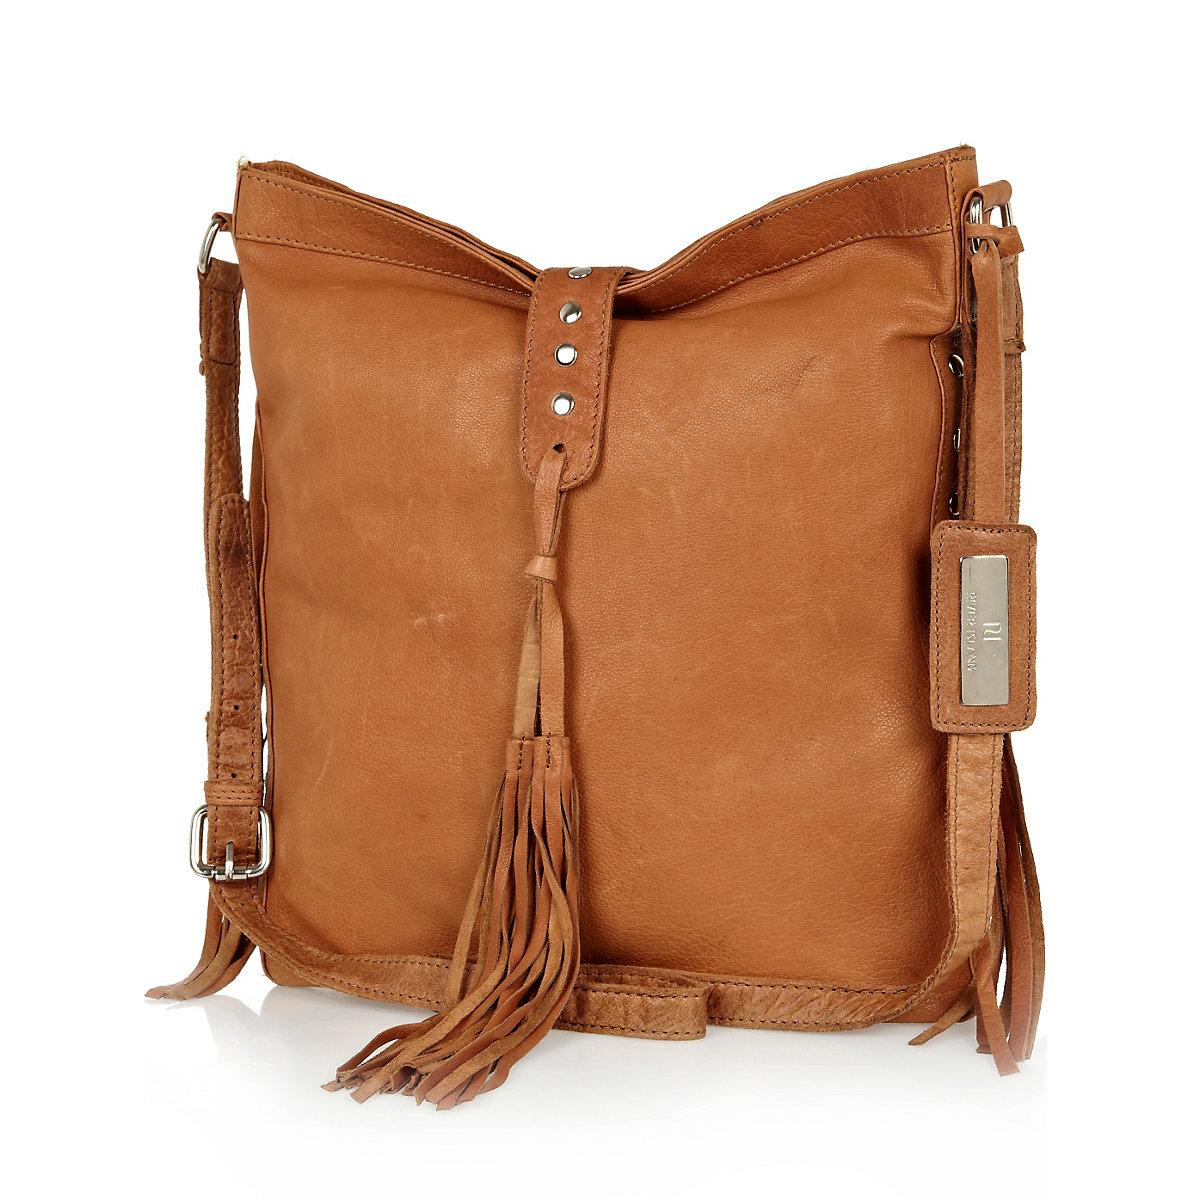 Tan leather tassel messenger bag